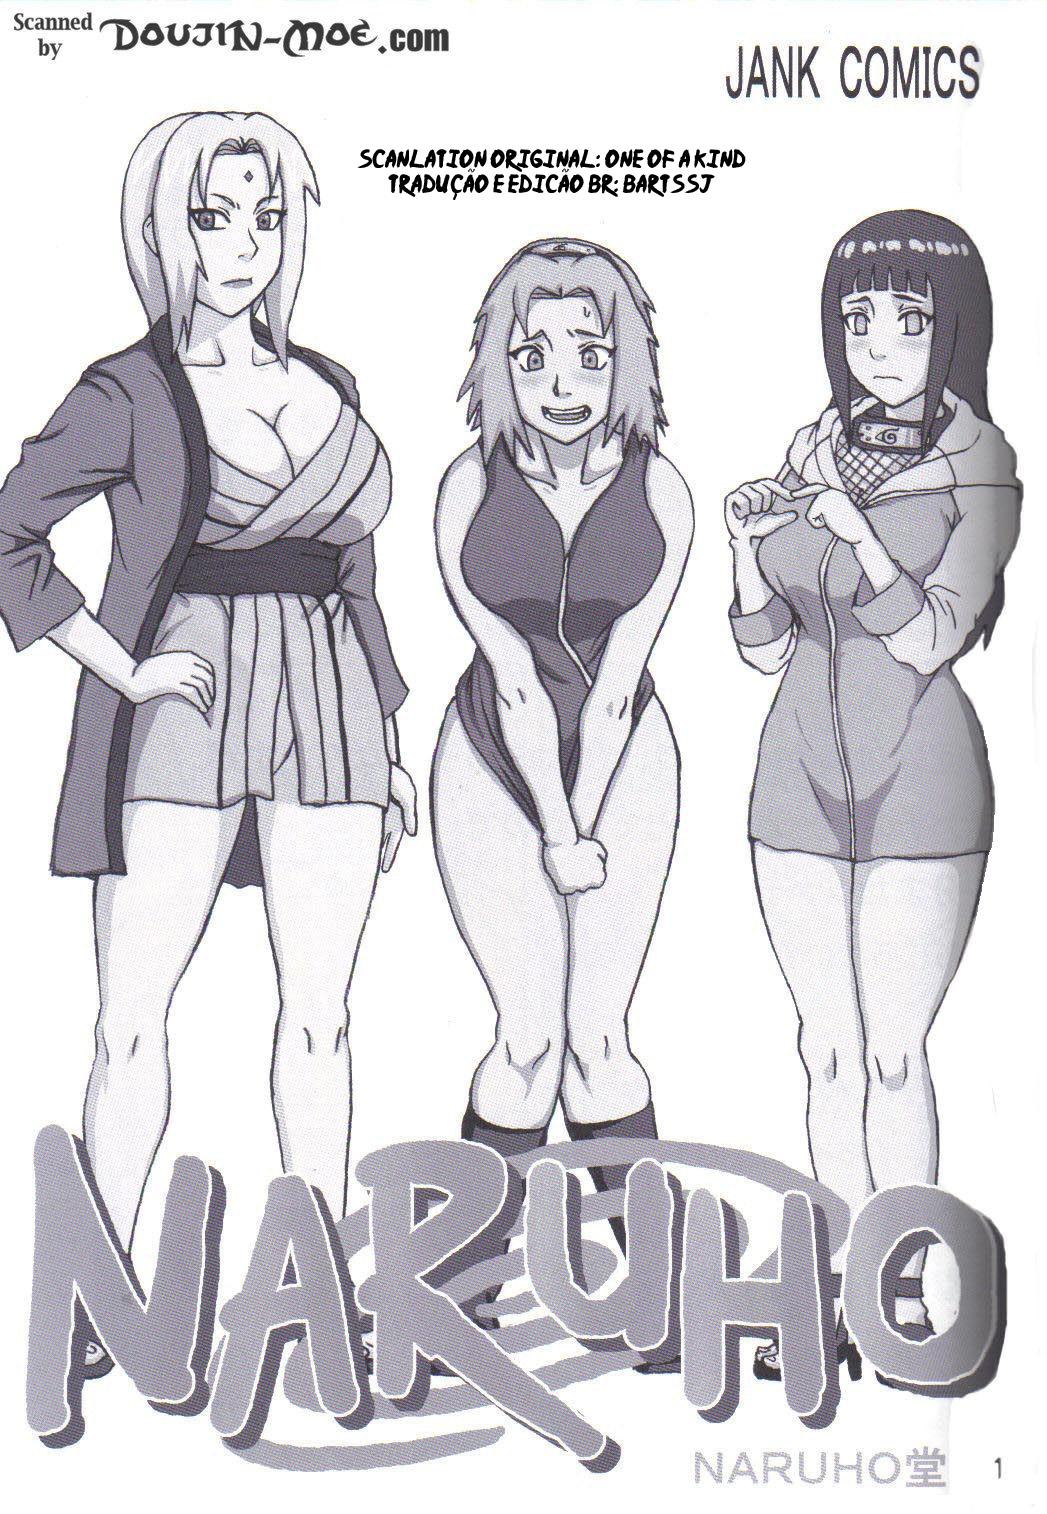 Watching woman naruto manga hentai